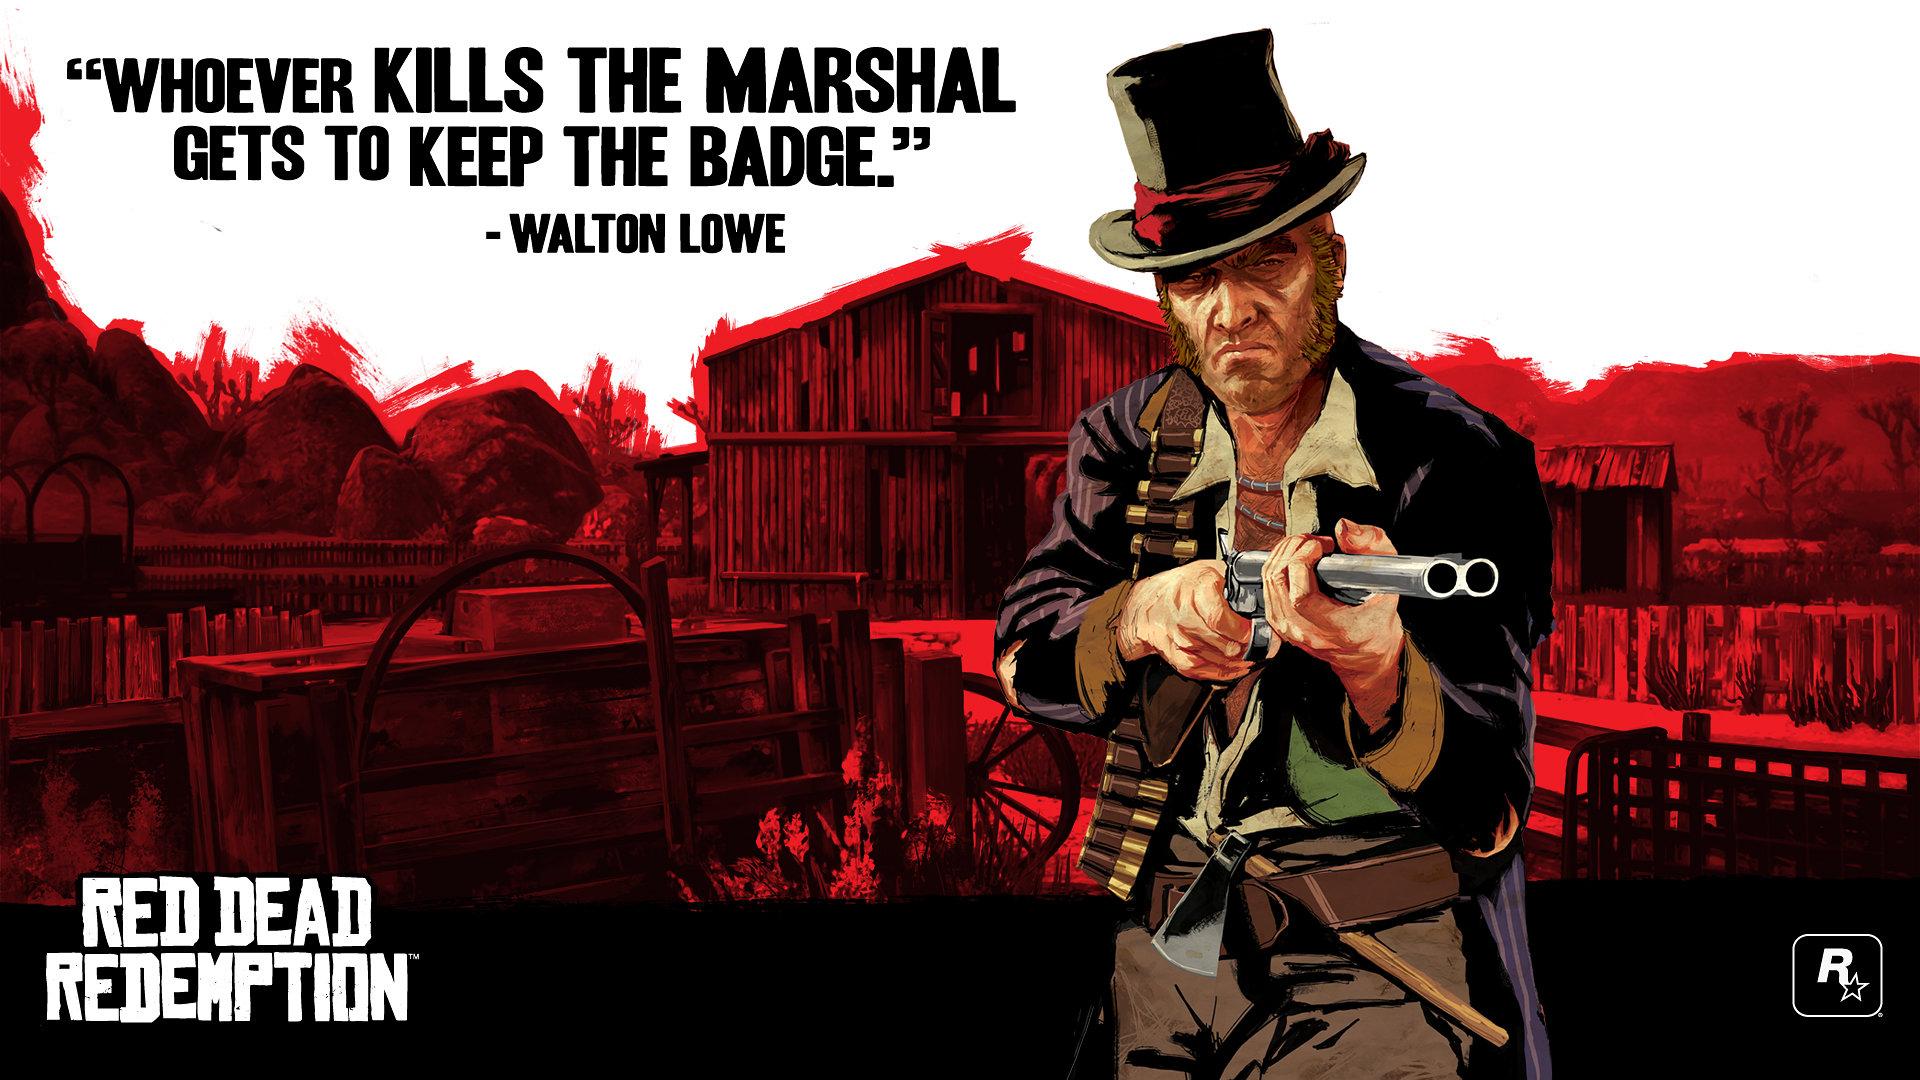 Download Full Hd 1920x1080 Red Dead Redemption Desktop Wallpaper